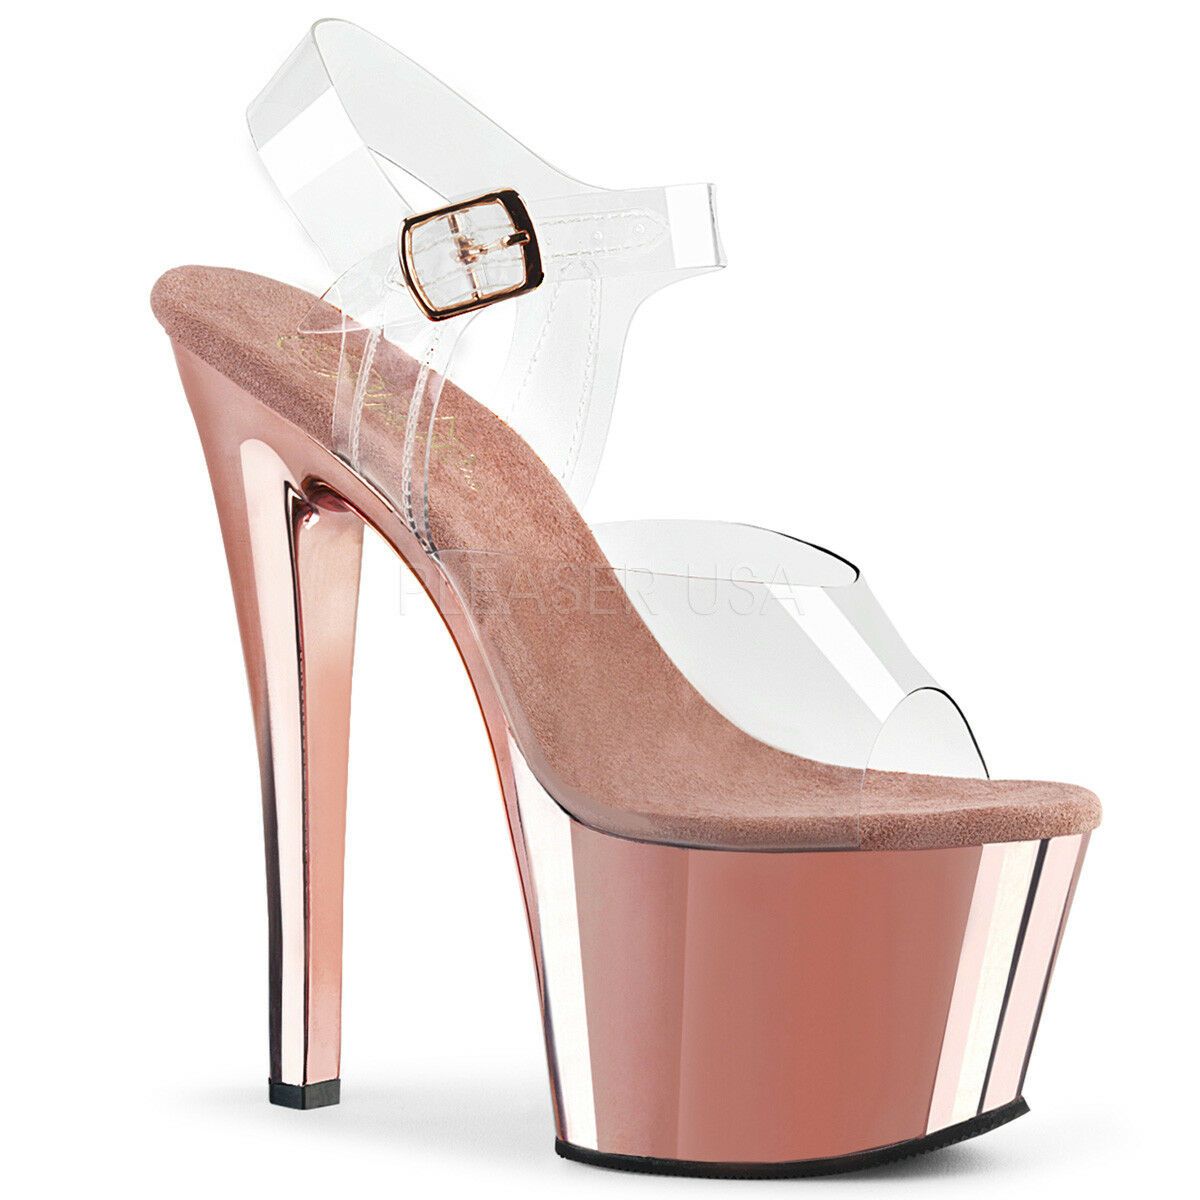 PLEASER SKY-308 CLEAR pink gold PLATFORM POLE DANCING STILETTO SHOES SANDALS